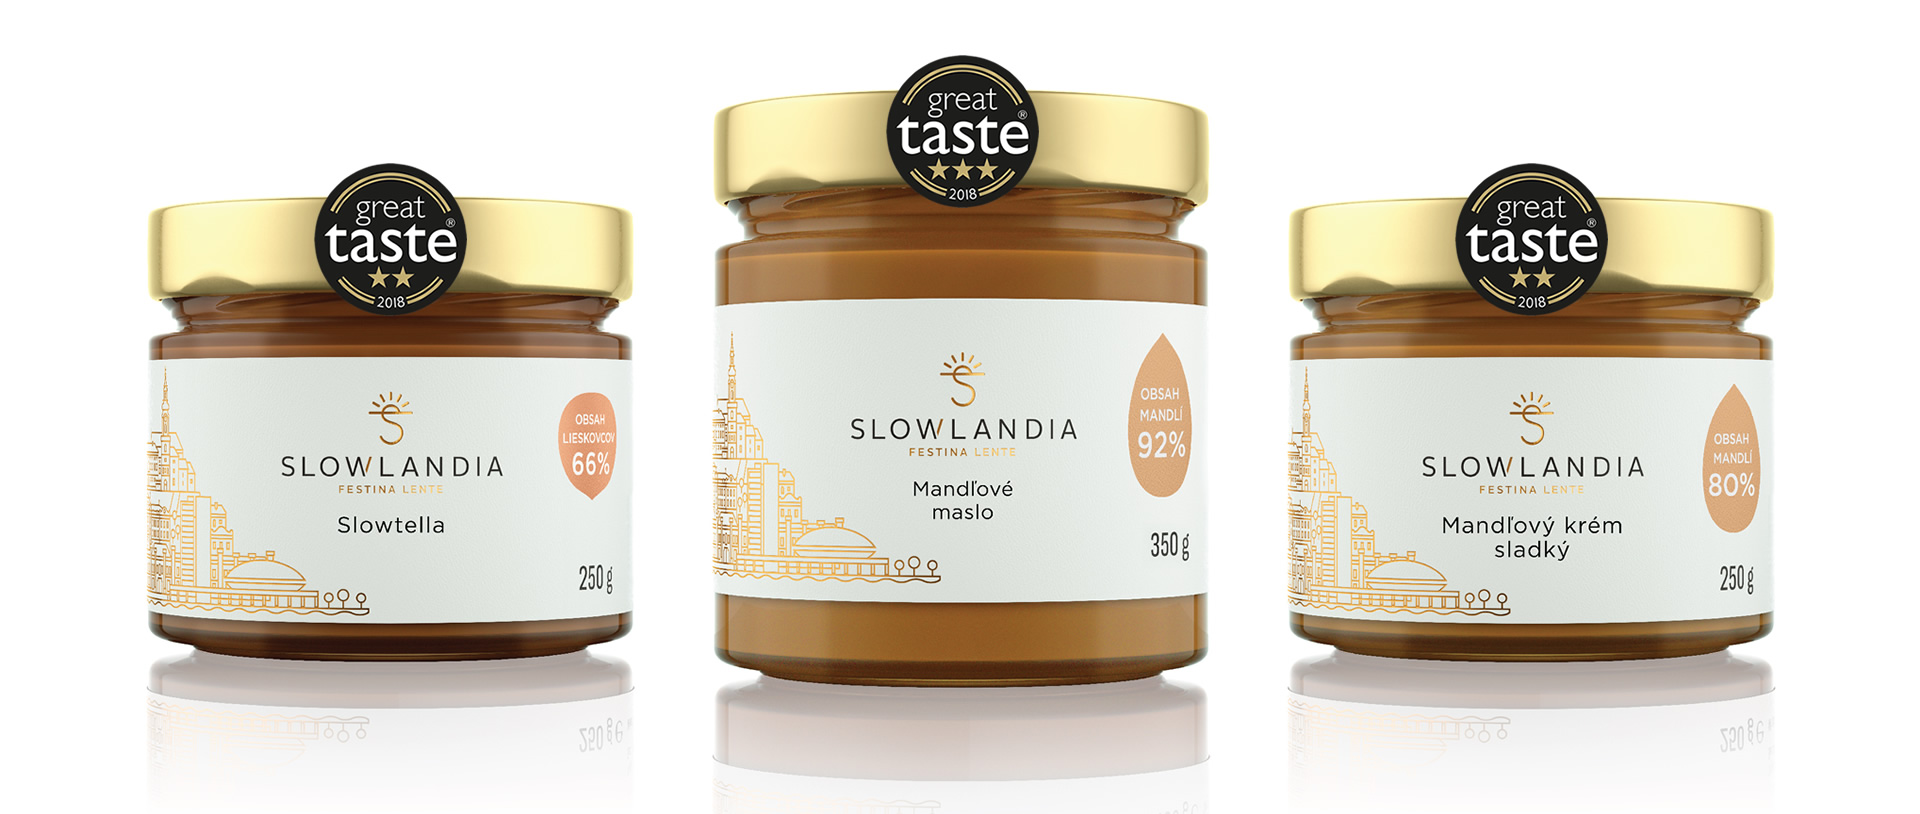 Slowlandia produkty Great Taste 2018 banner